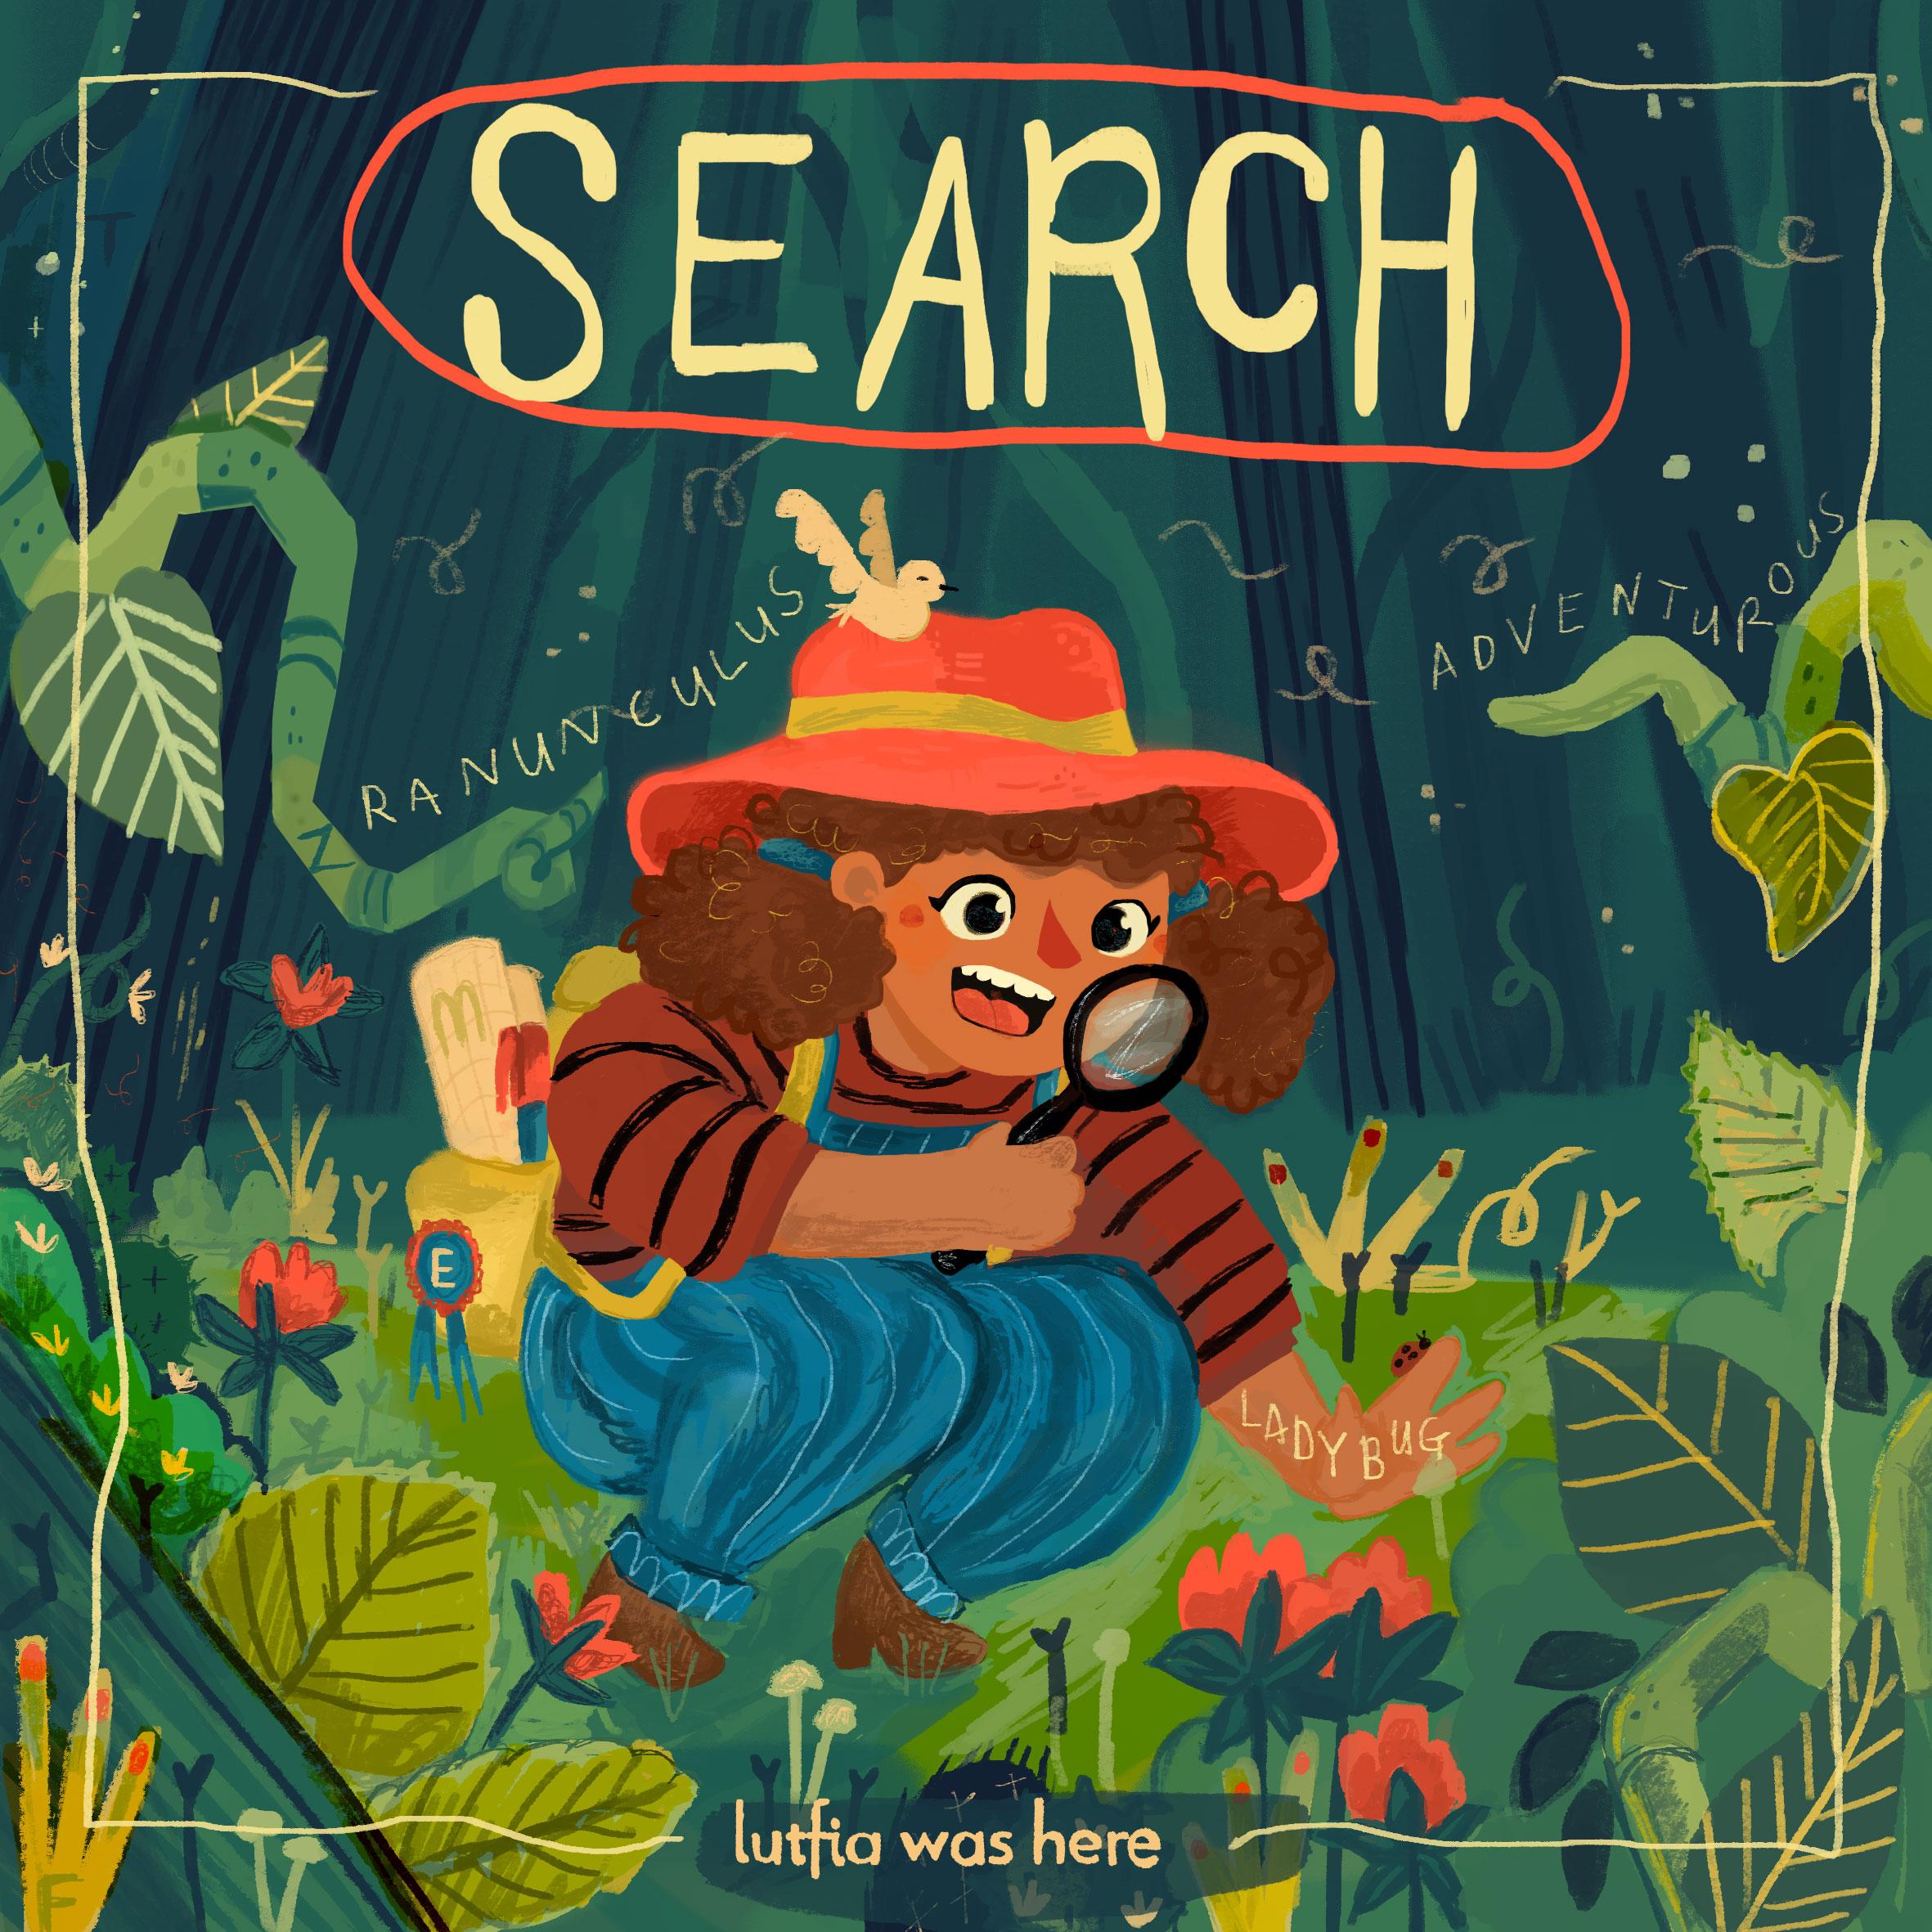 Search_Childhoodweek_Lutfia Kamish.jpg